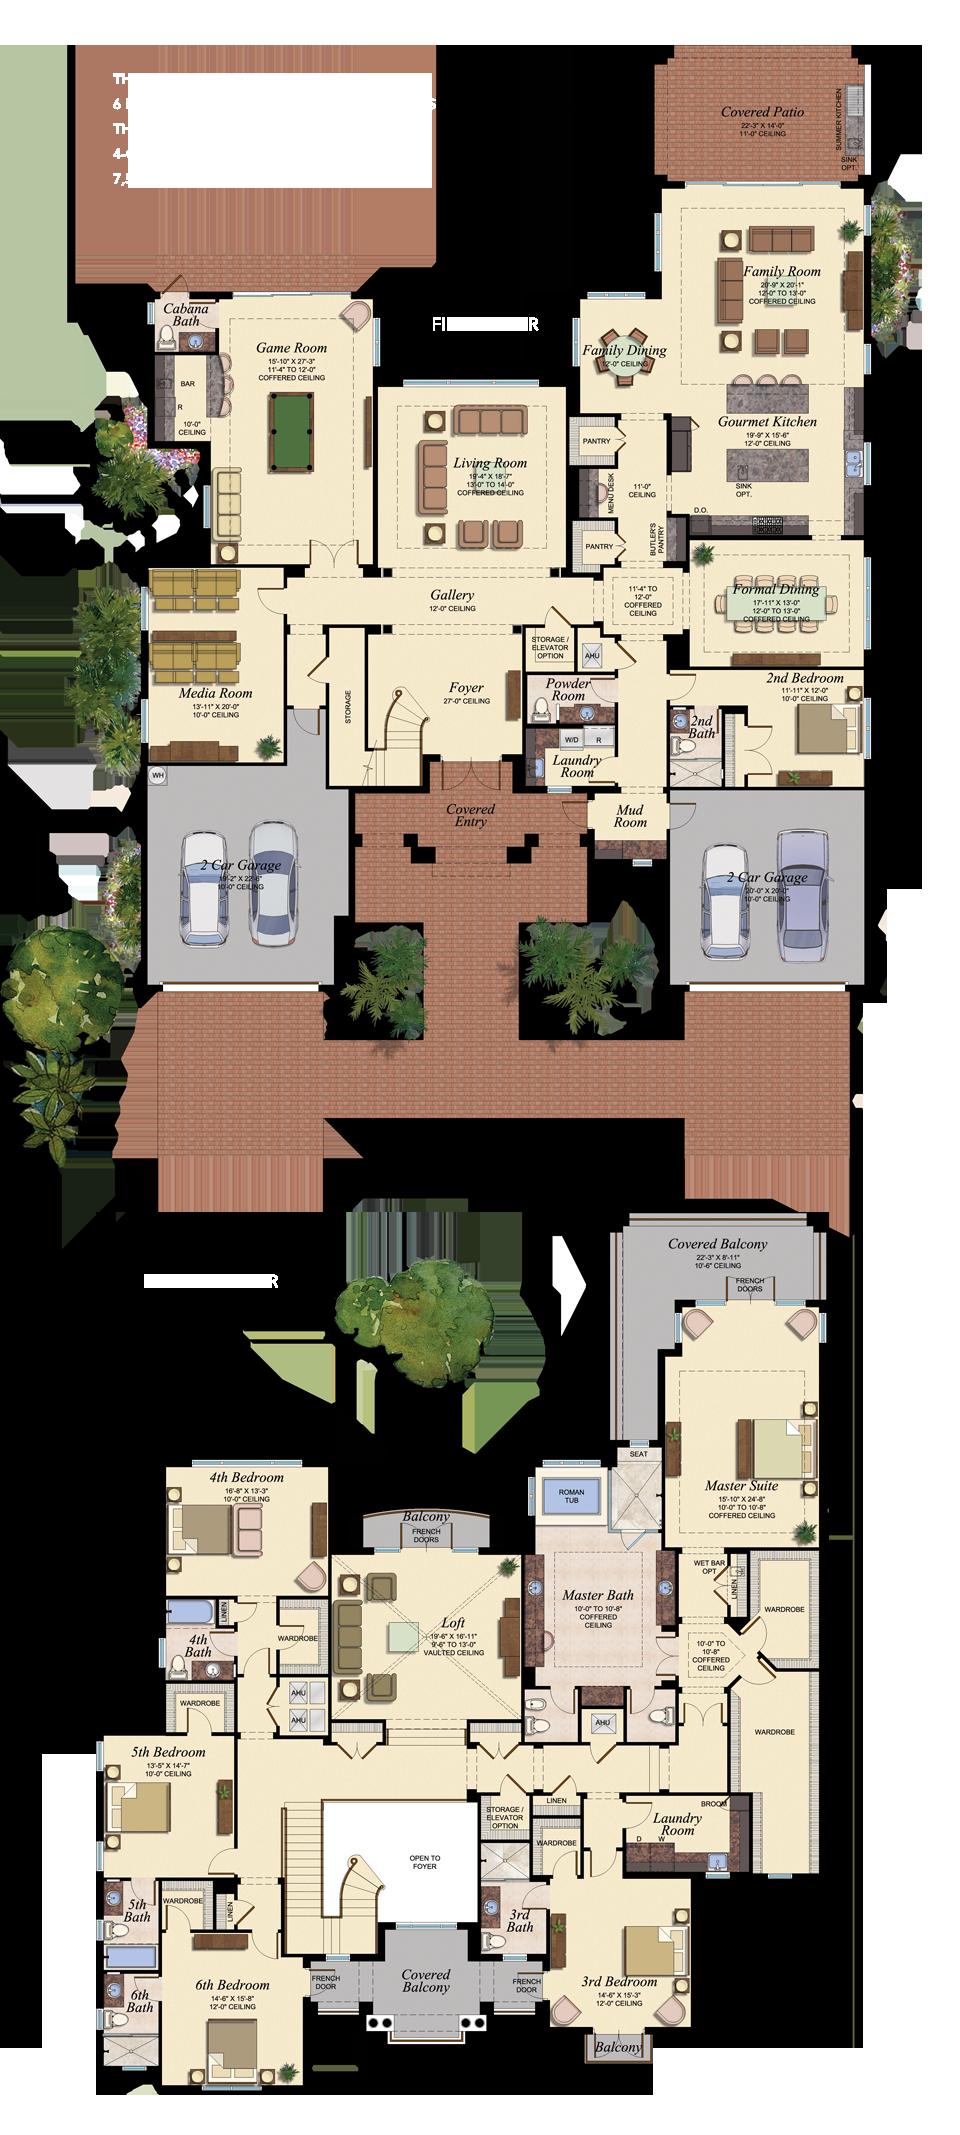 3 master bedroom apartments  The Oaks at Boca Raton  Lot  floor plan  floorplan  Pinterest